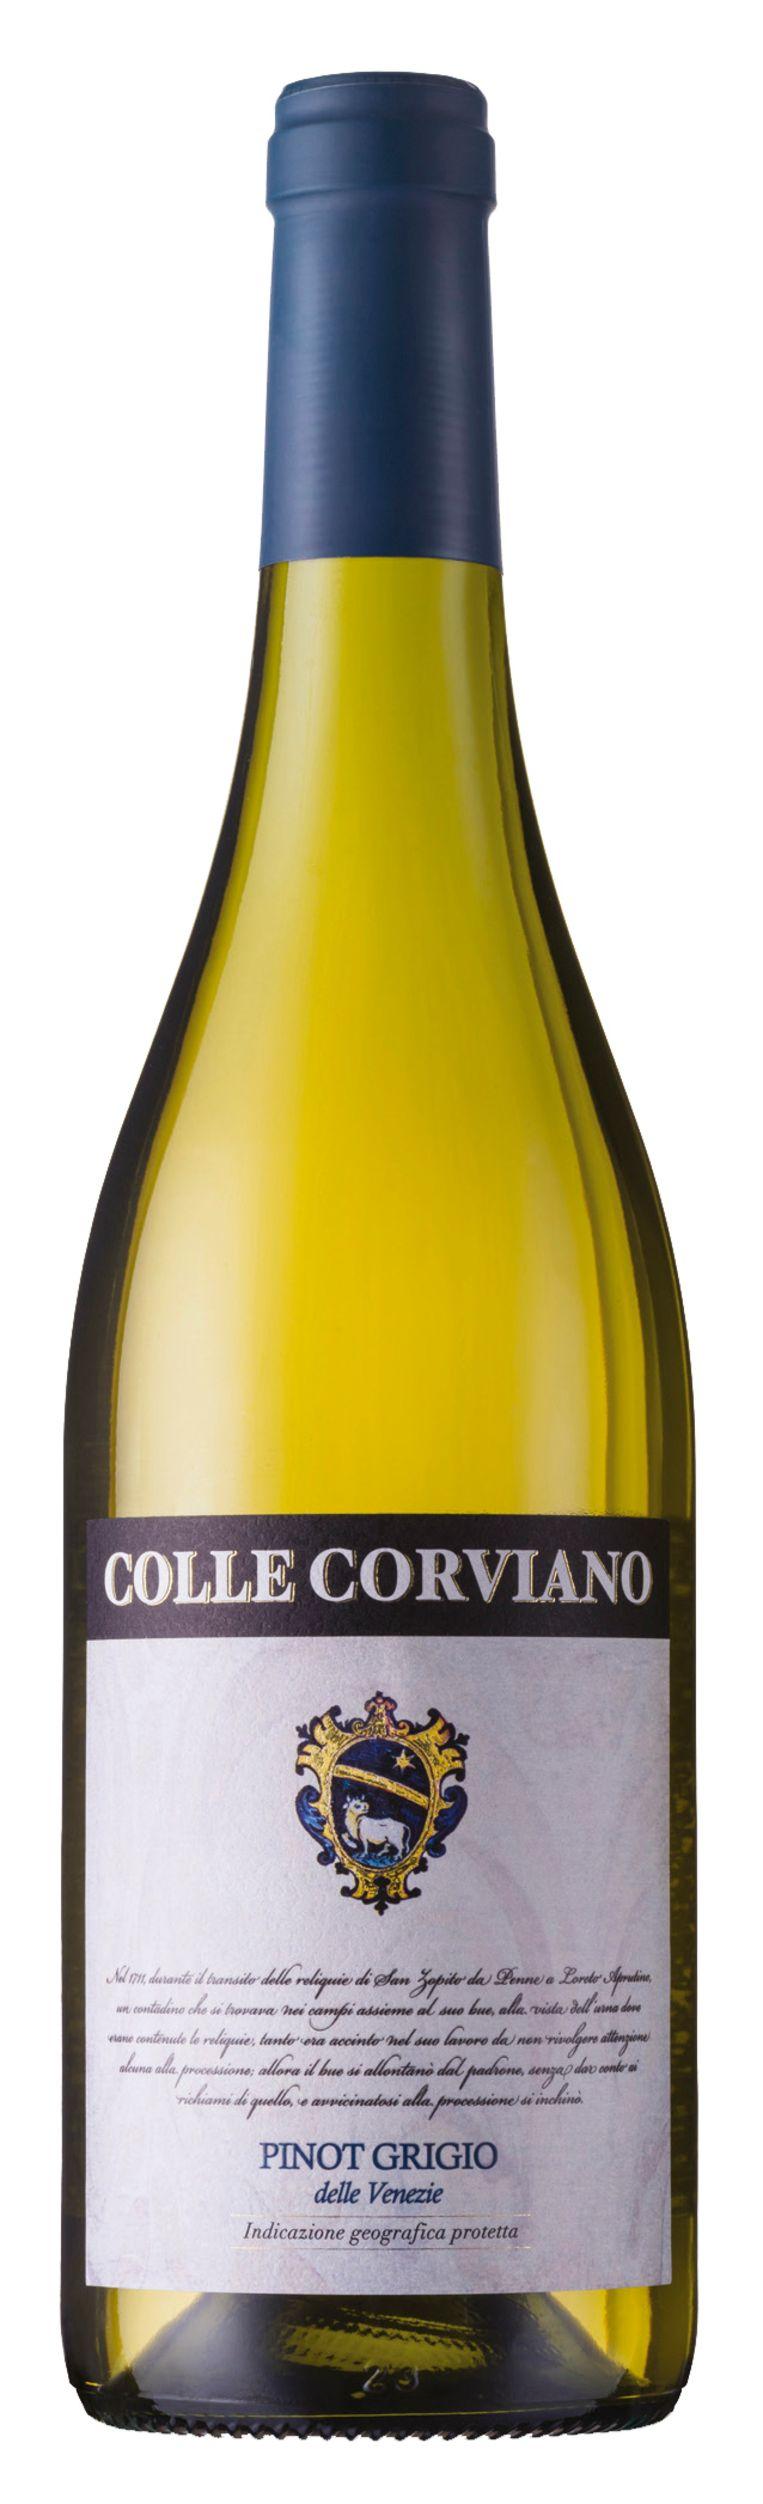 Colle Corviano 2019 Beeld